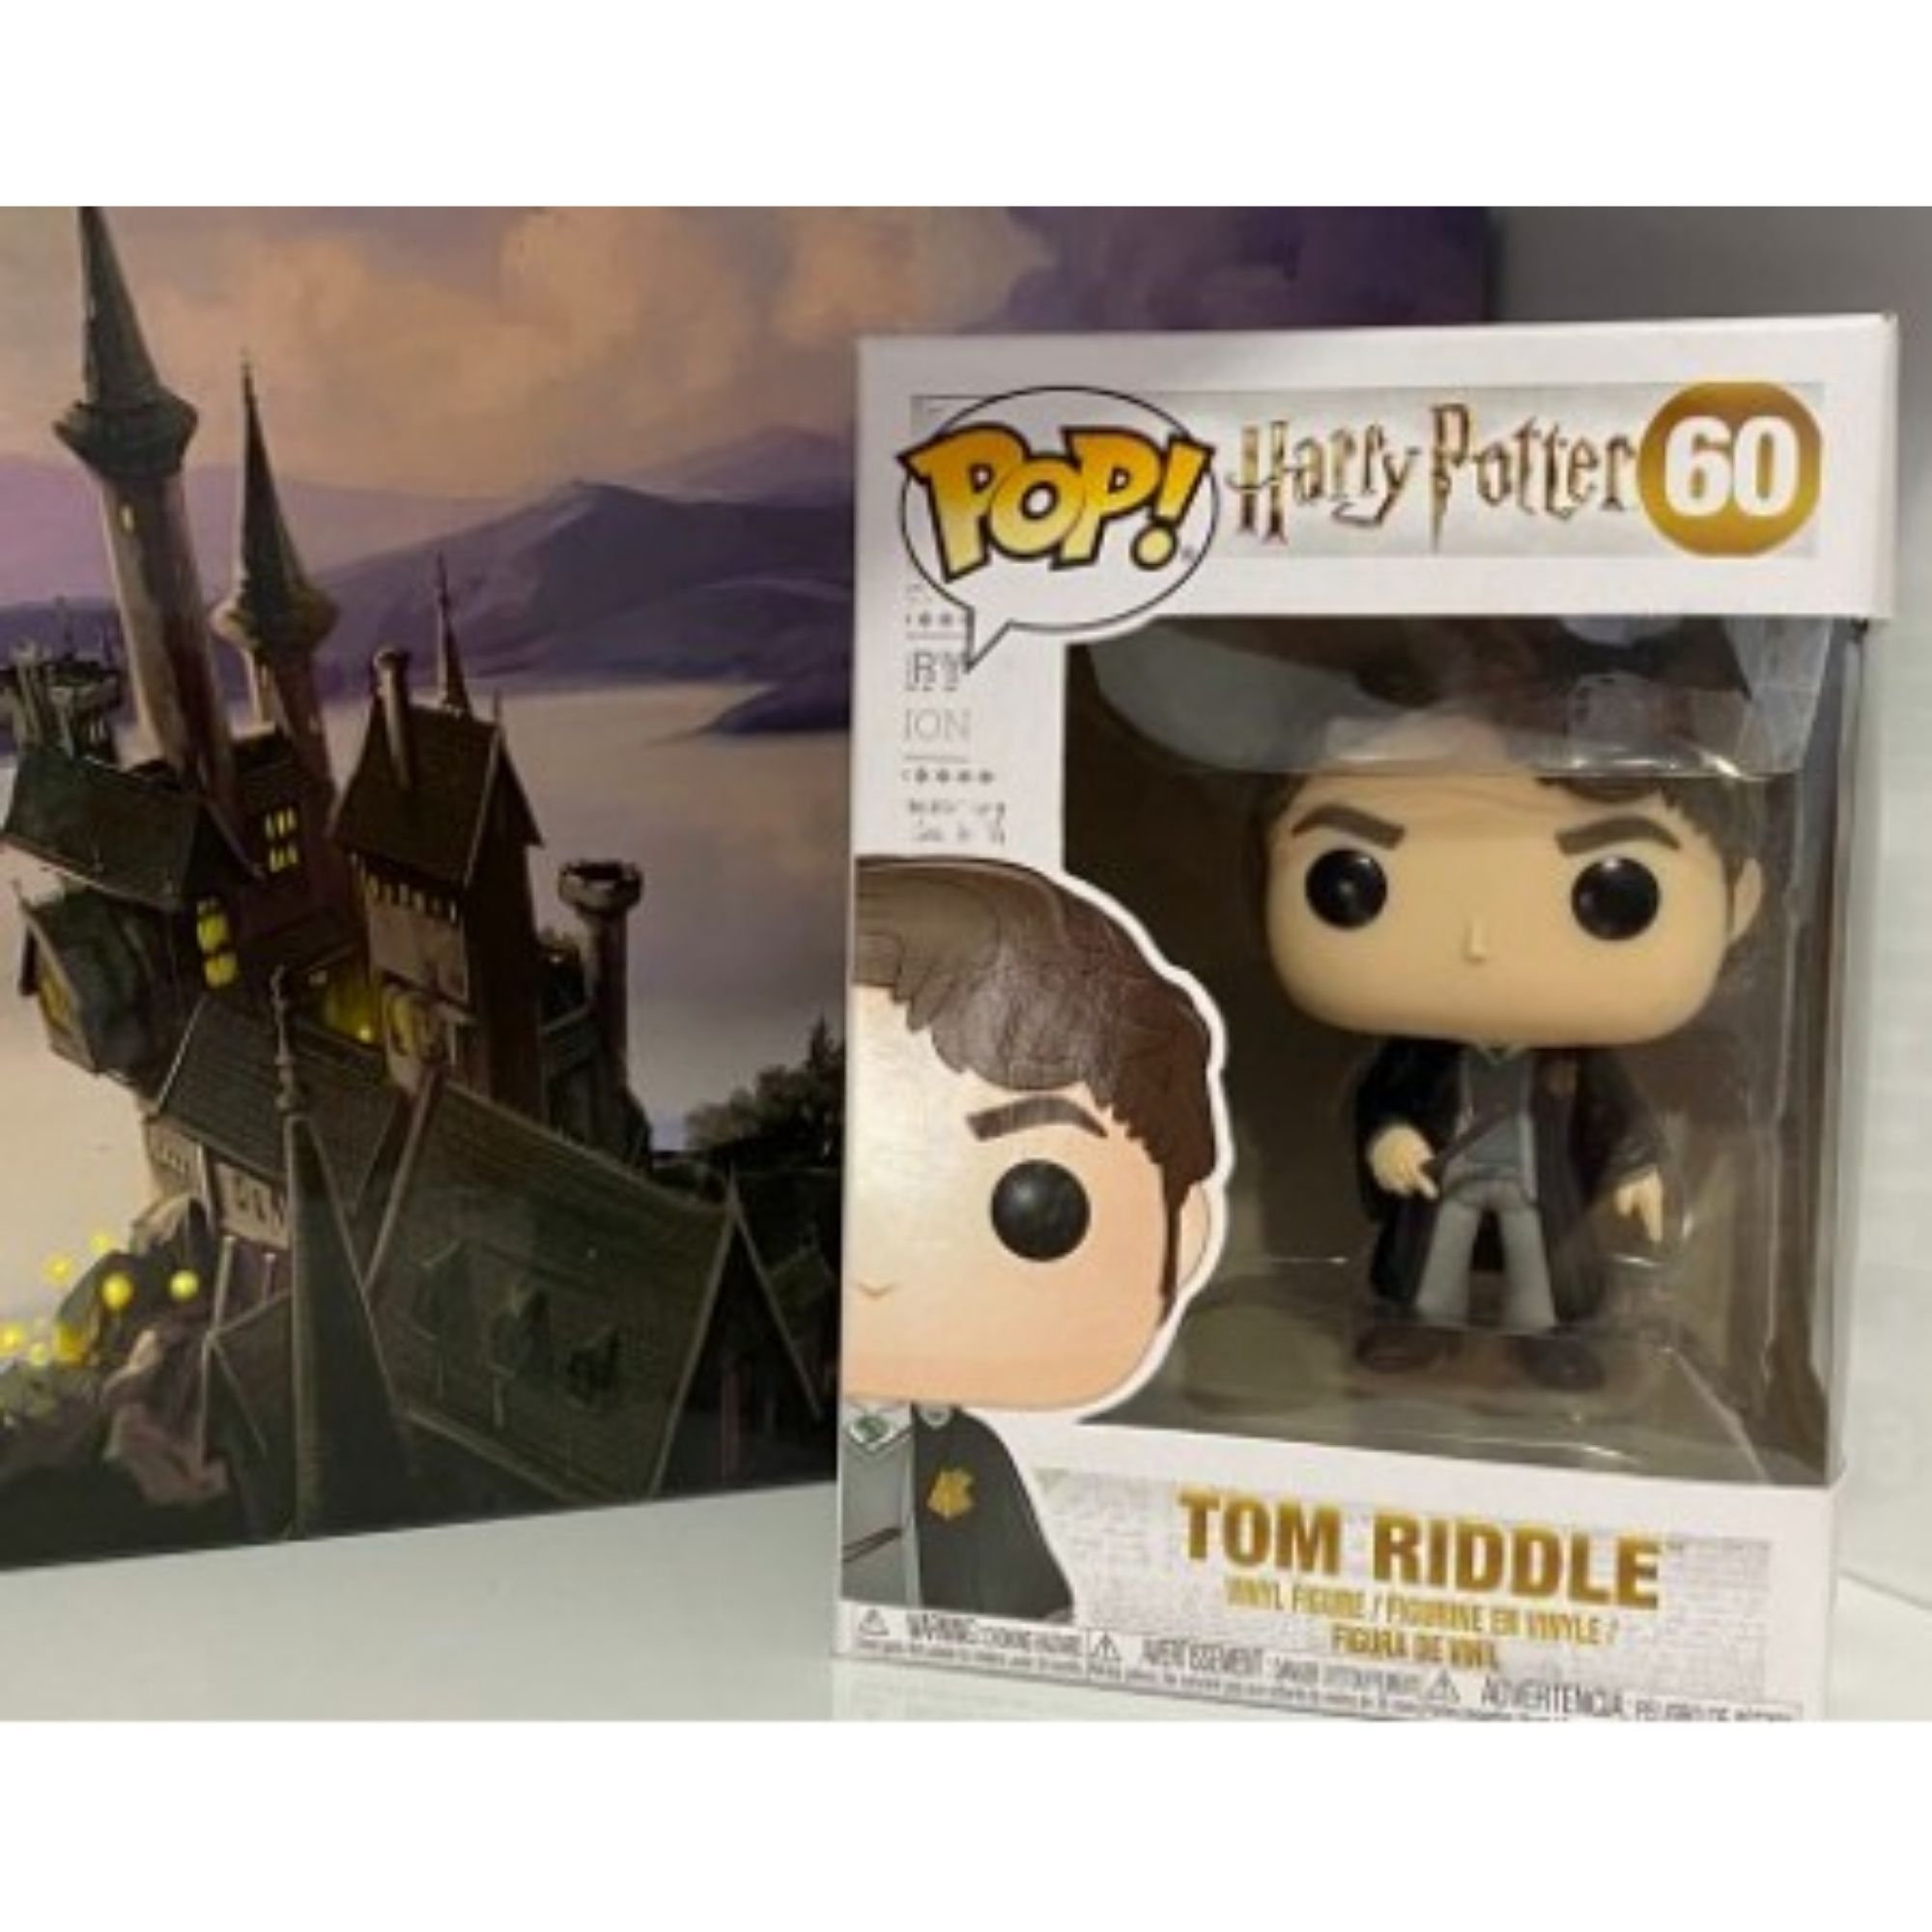 Funko Pop Harry Potter Tom Riddle #60  - Game Land Brinquedos